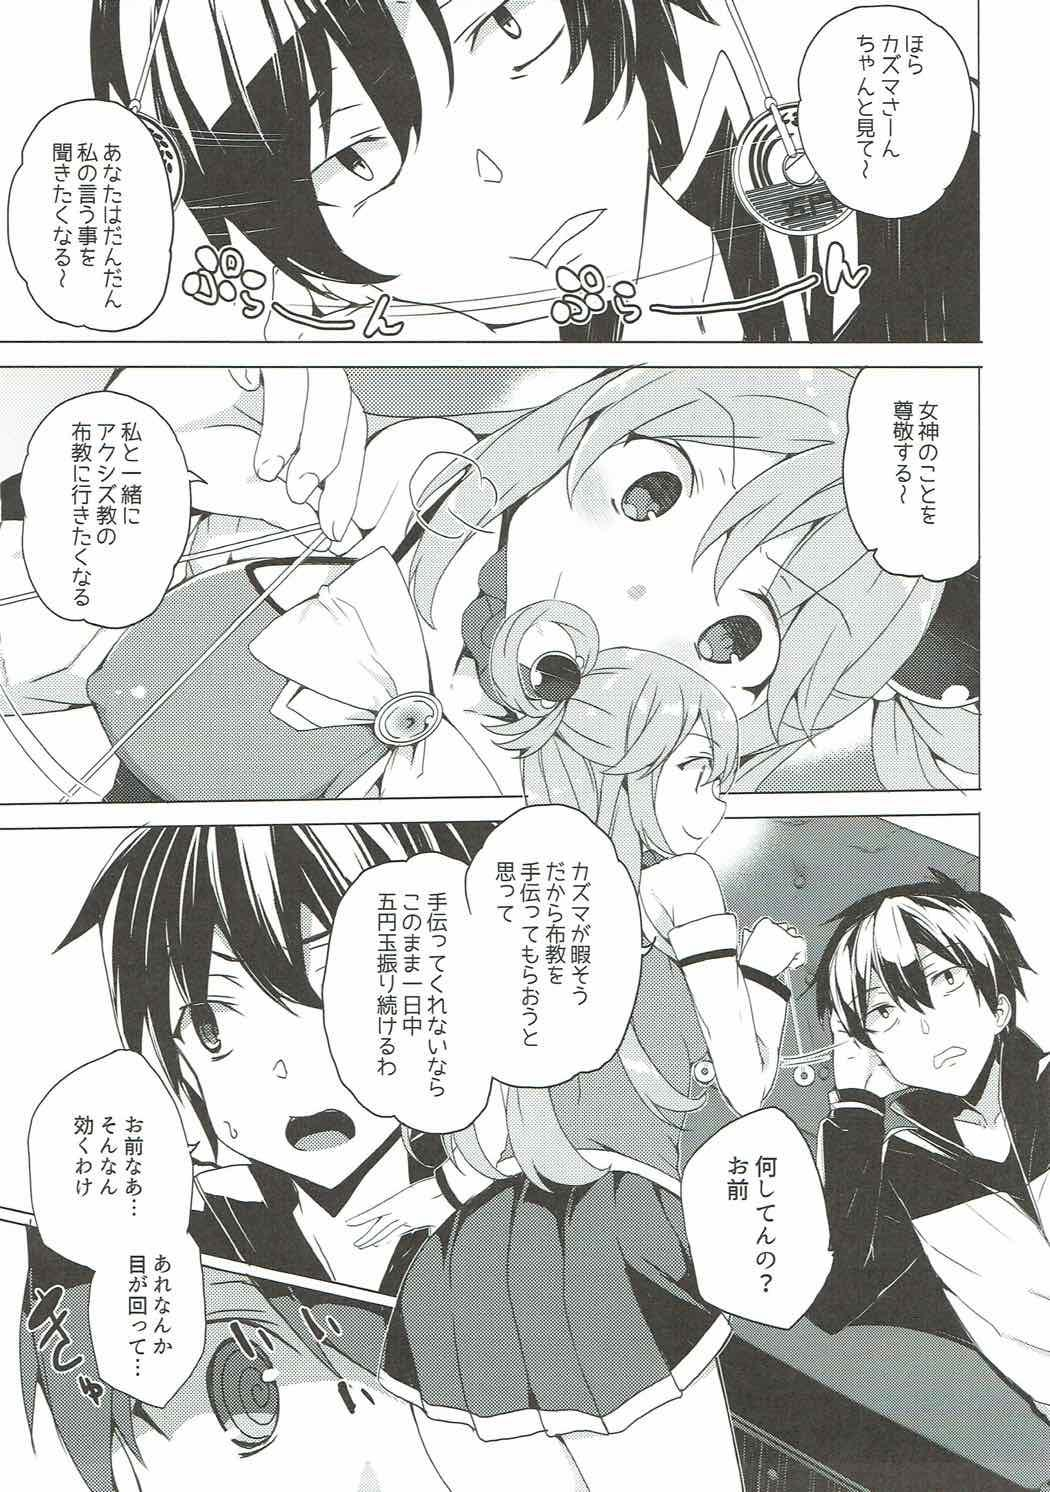 Axis-kyou ni Haitte kudasai 2